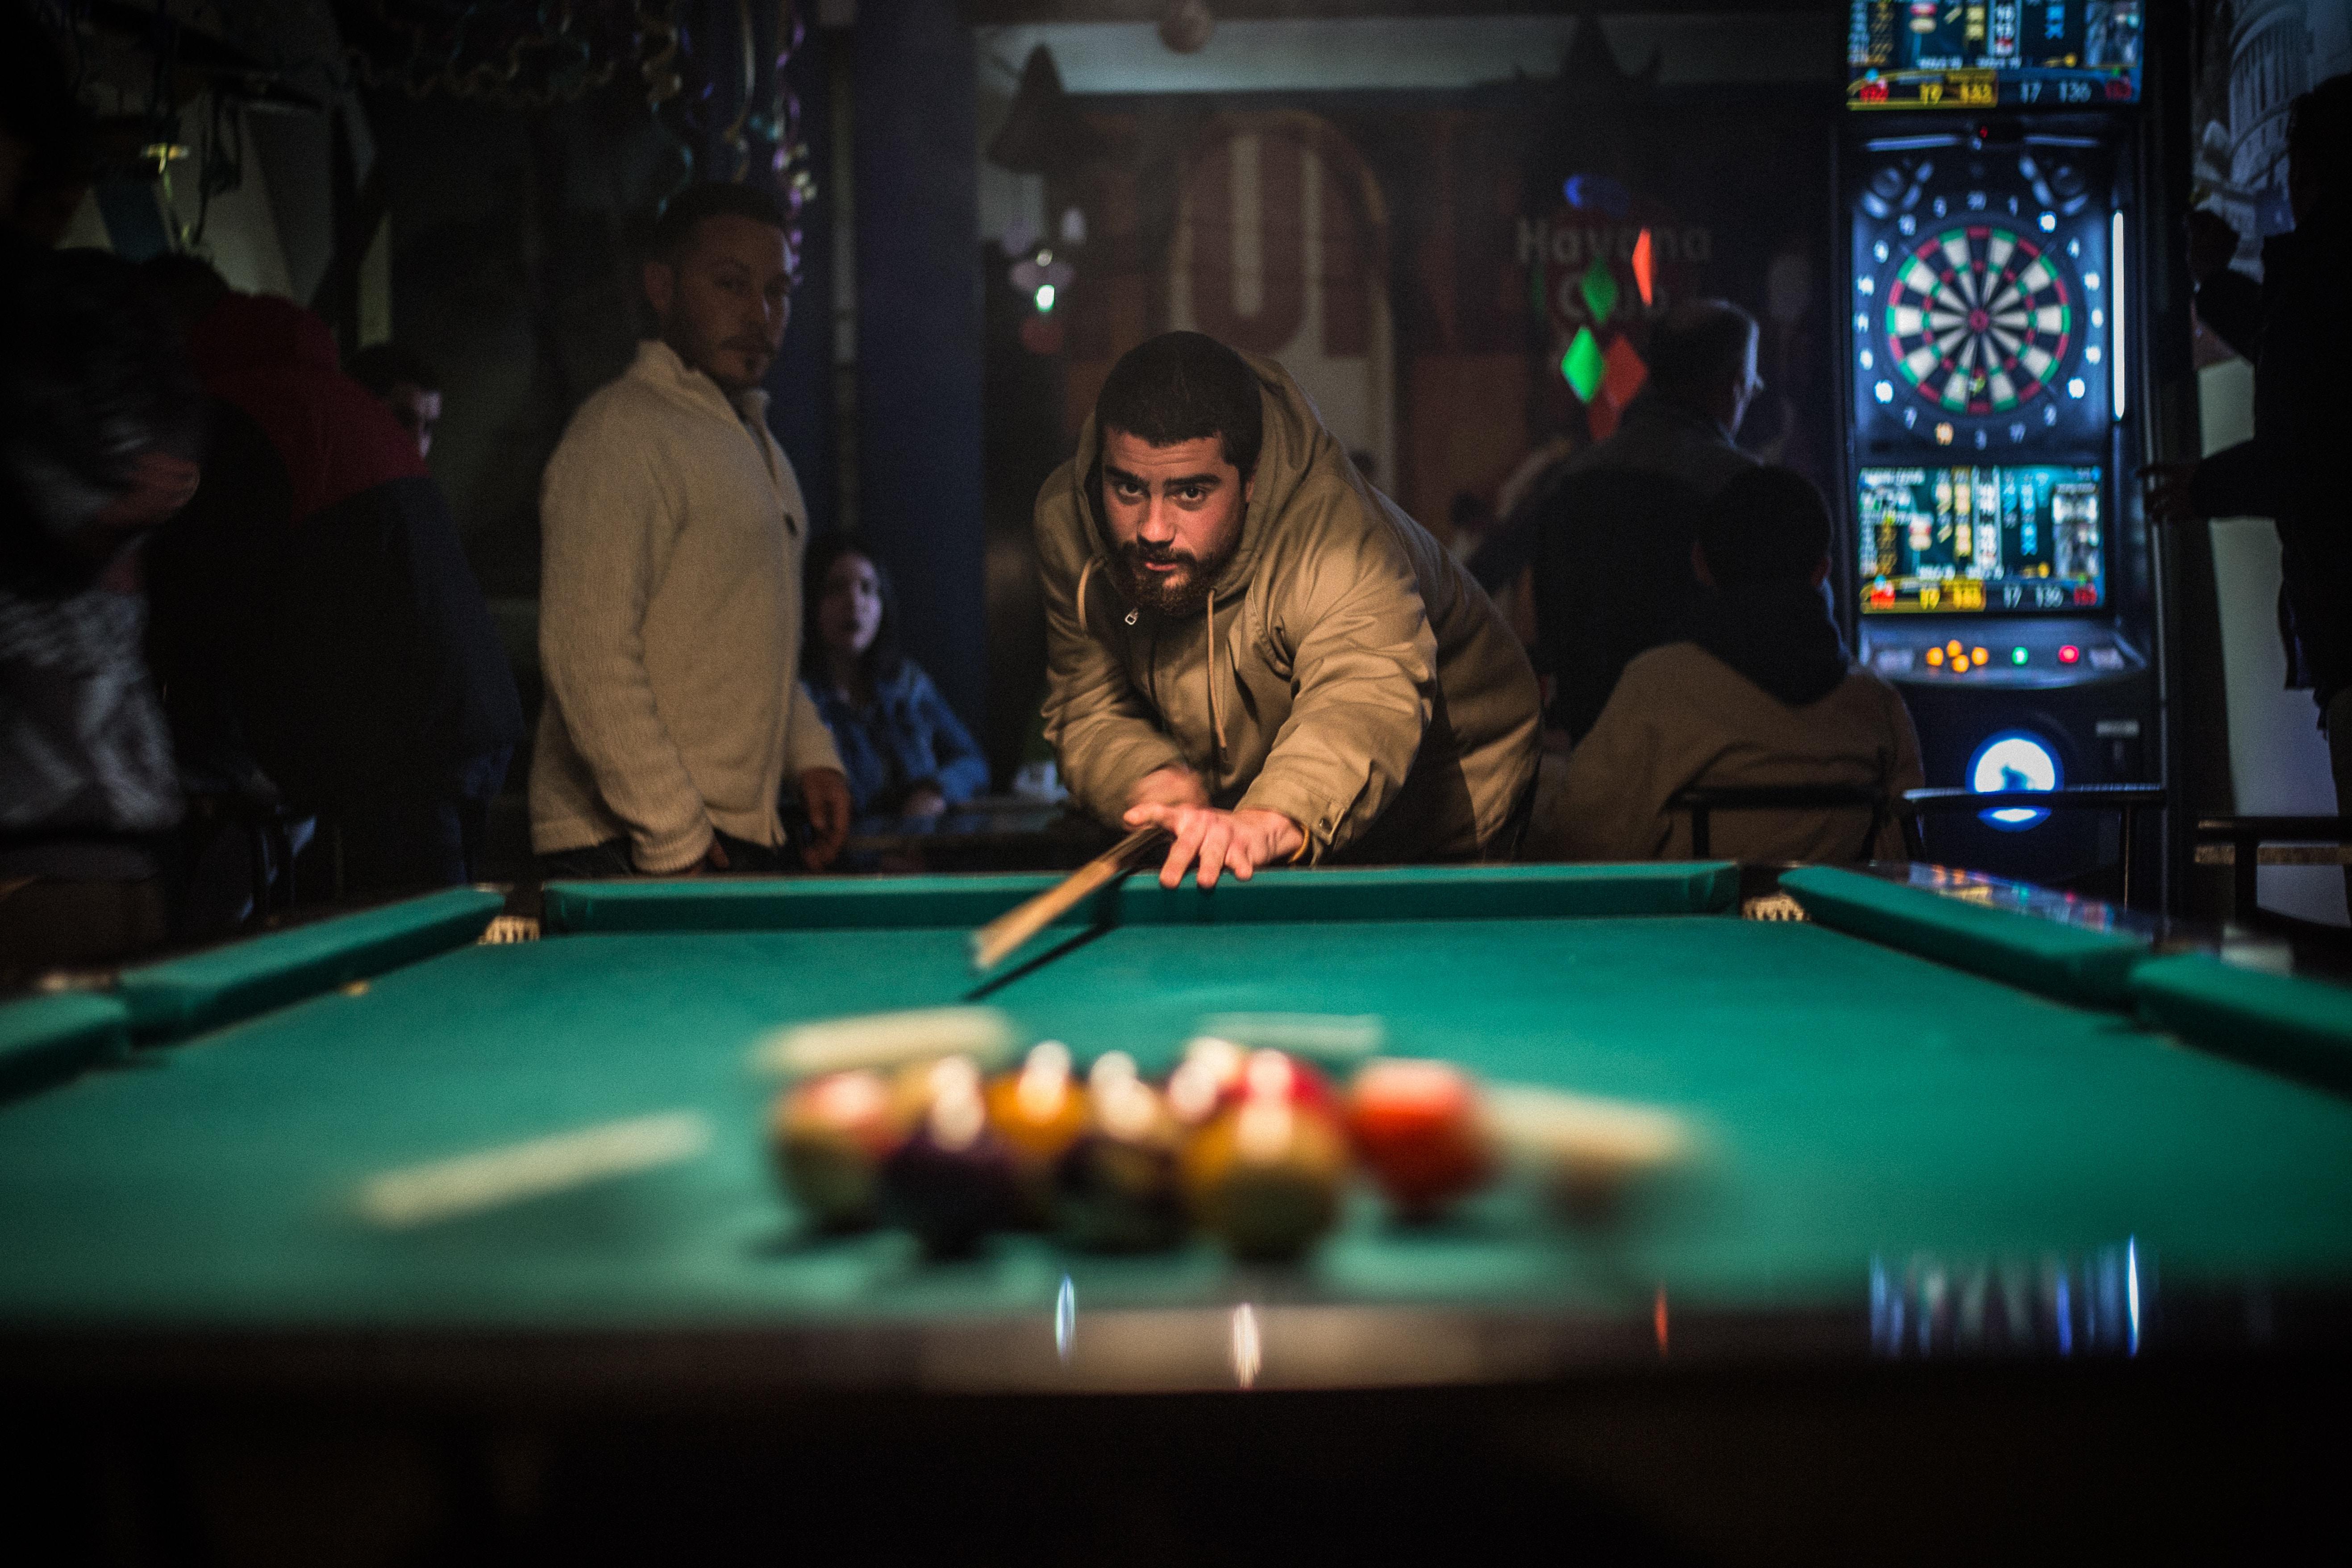 man in brown jacket playing billiard